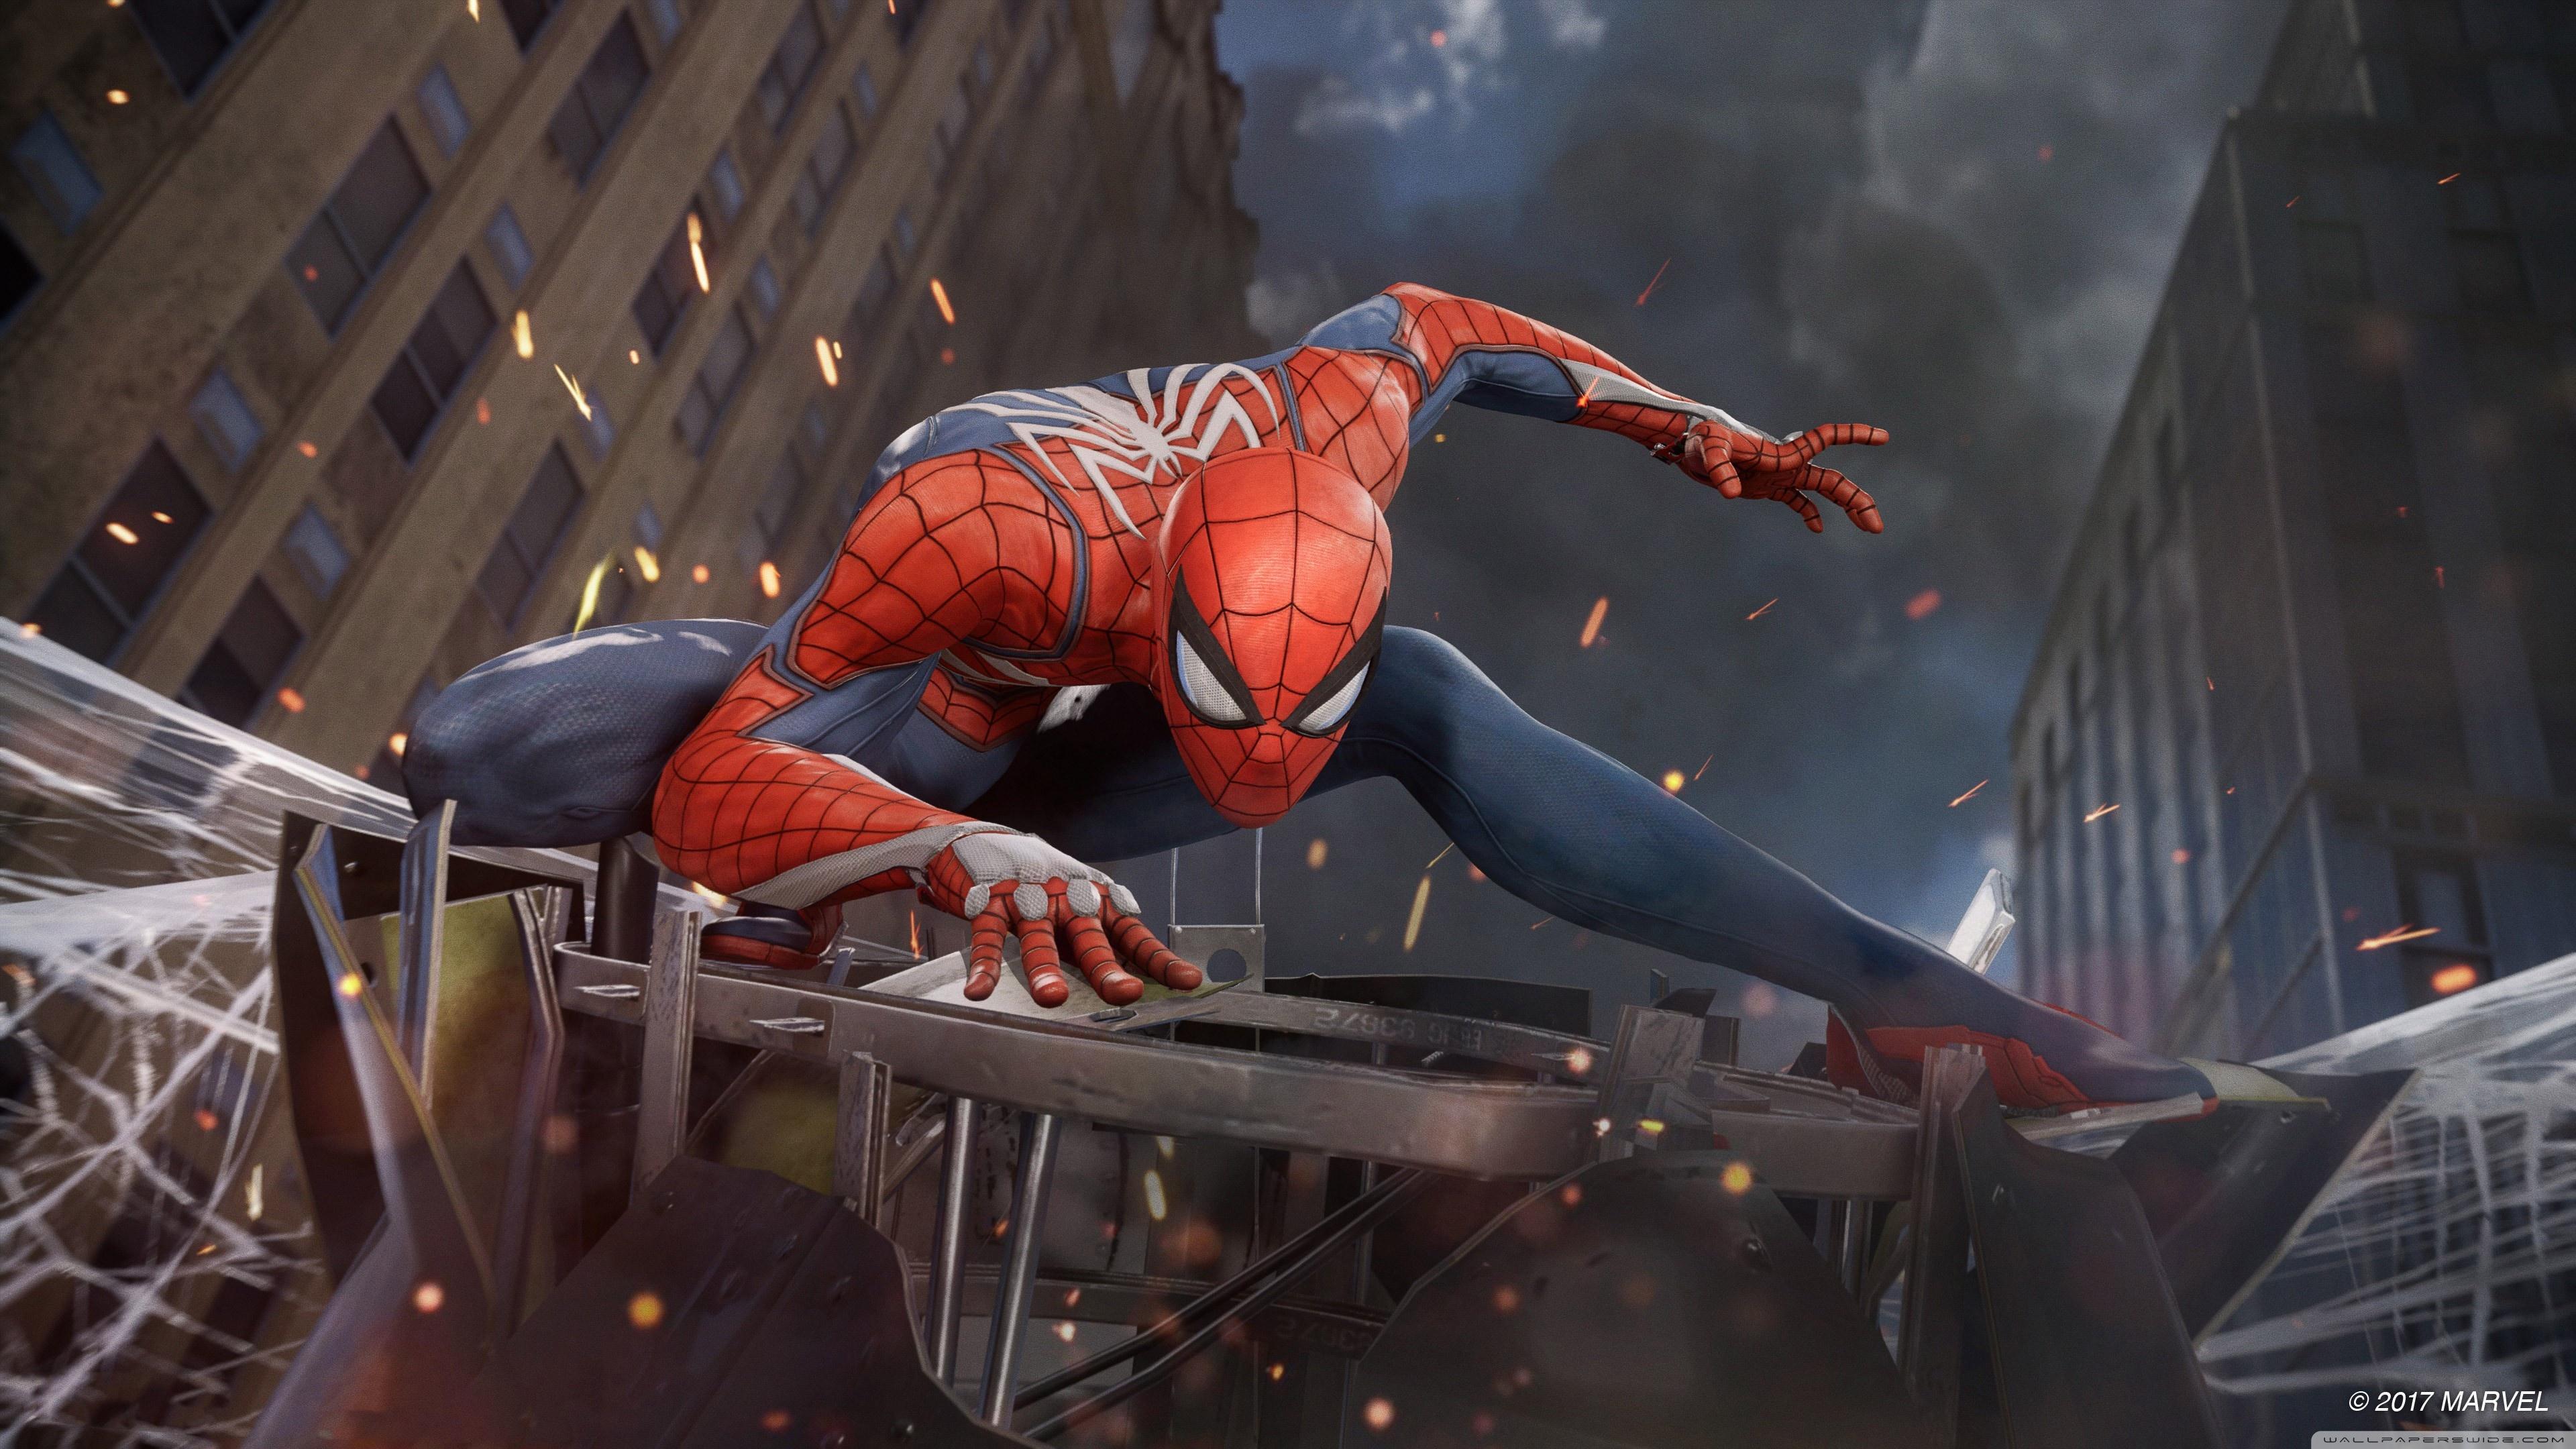 23 4k Marvel Characters Wallpapers On Wallpapersafari